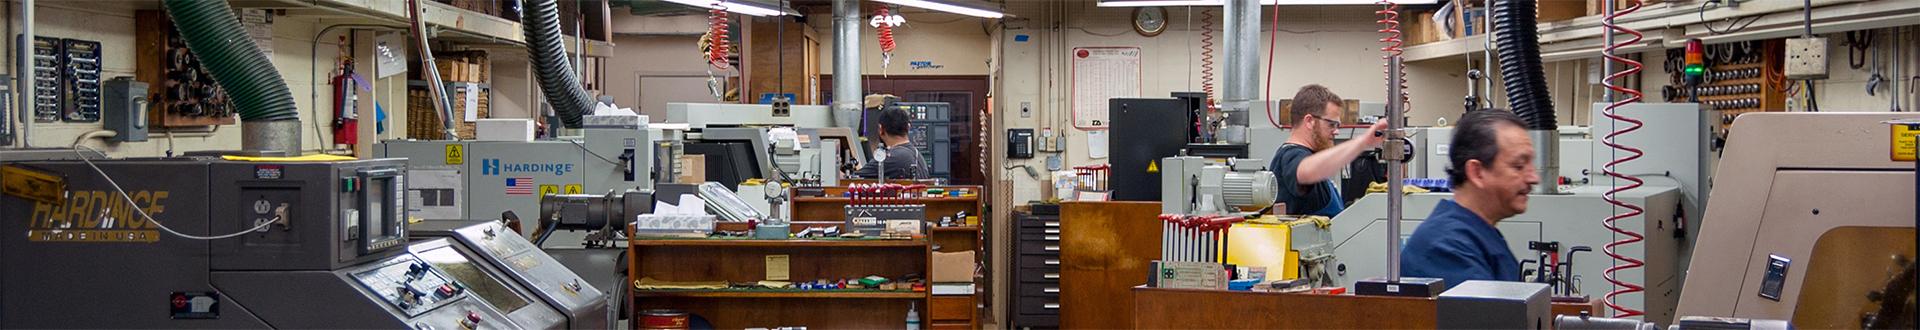 rothlisberger manufacturing shop floor